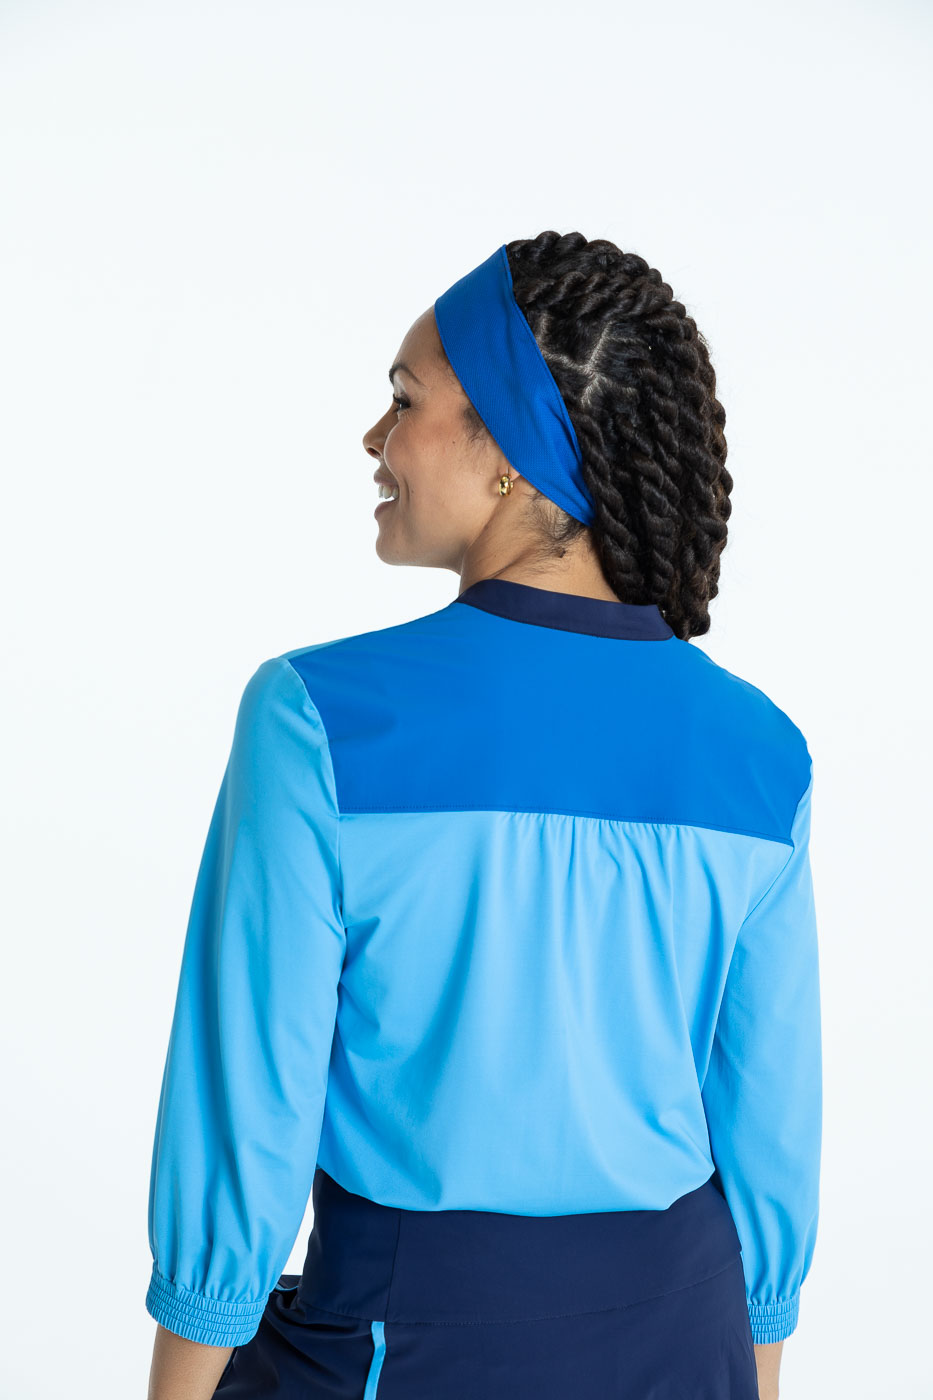 Back view of woman wearing a cornflower blue Swing Easy 3/4 Sleeve golf shirt